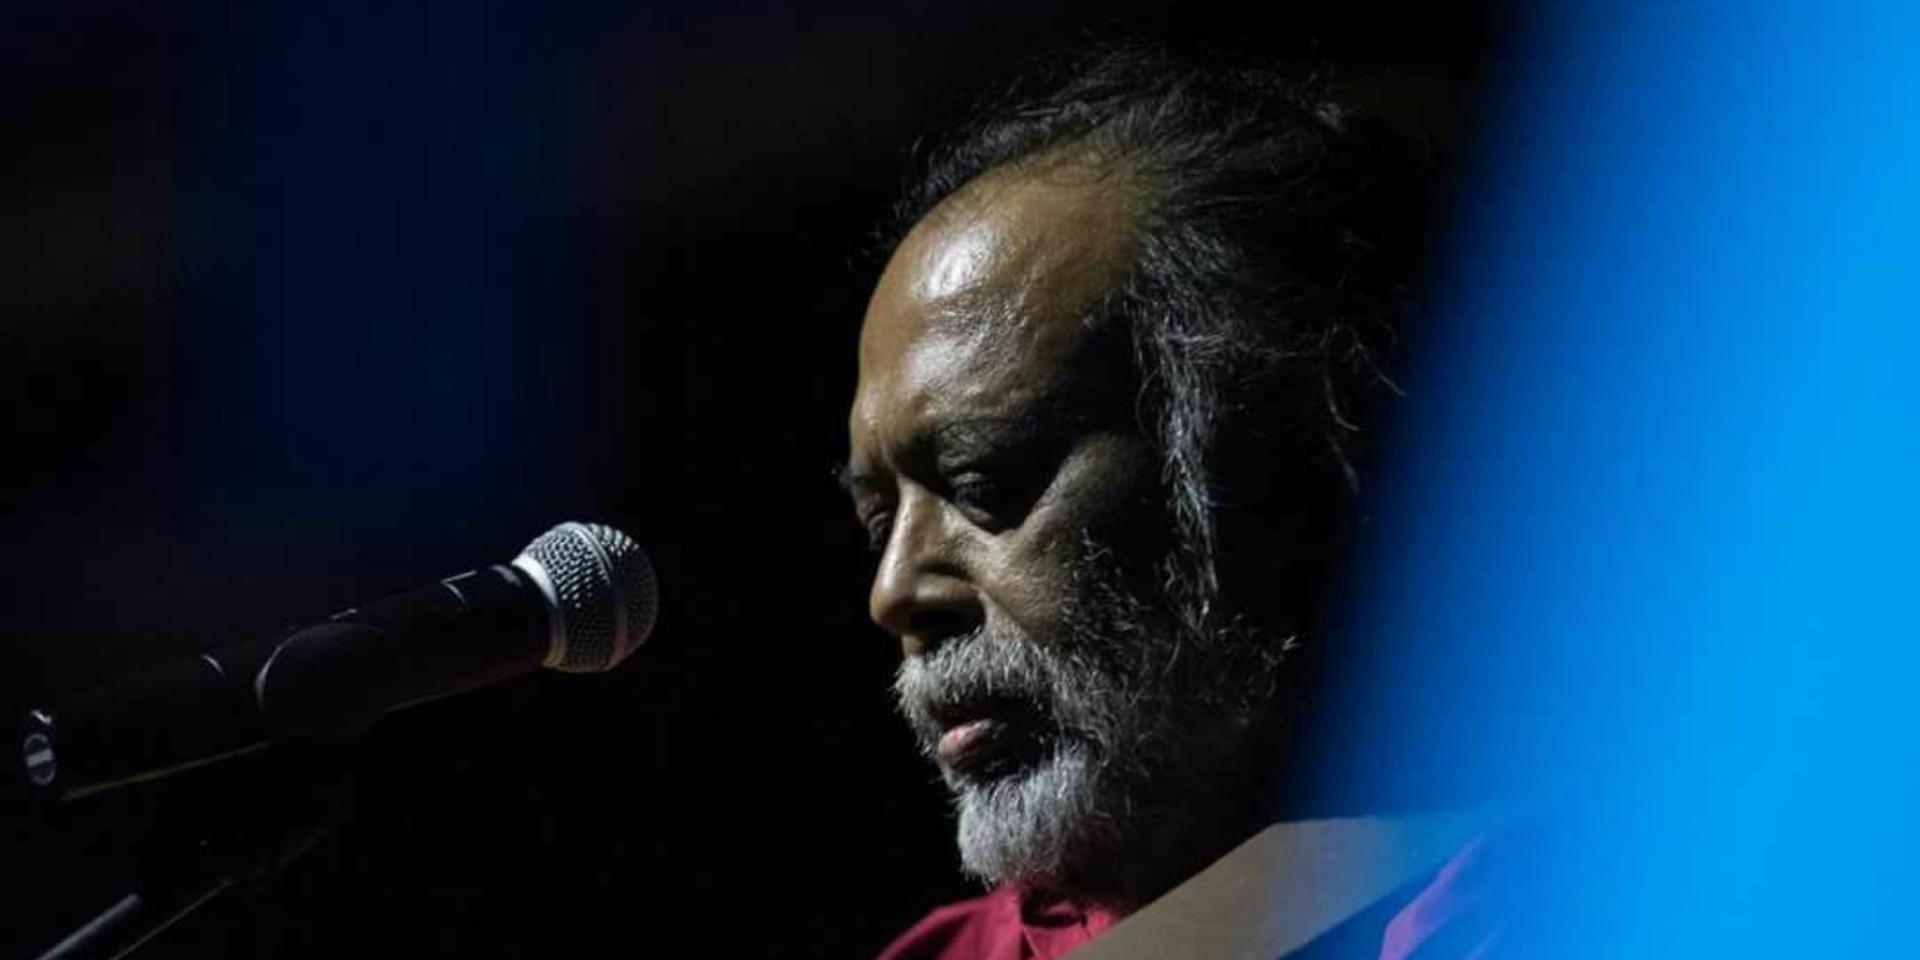 Singaporean rock legend Zul Sutan has passed away